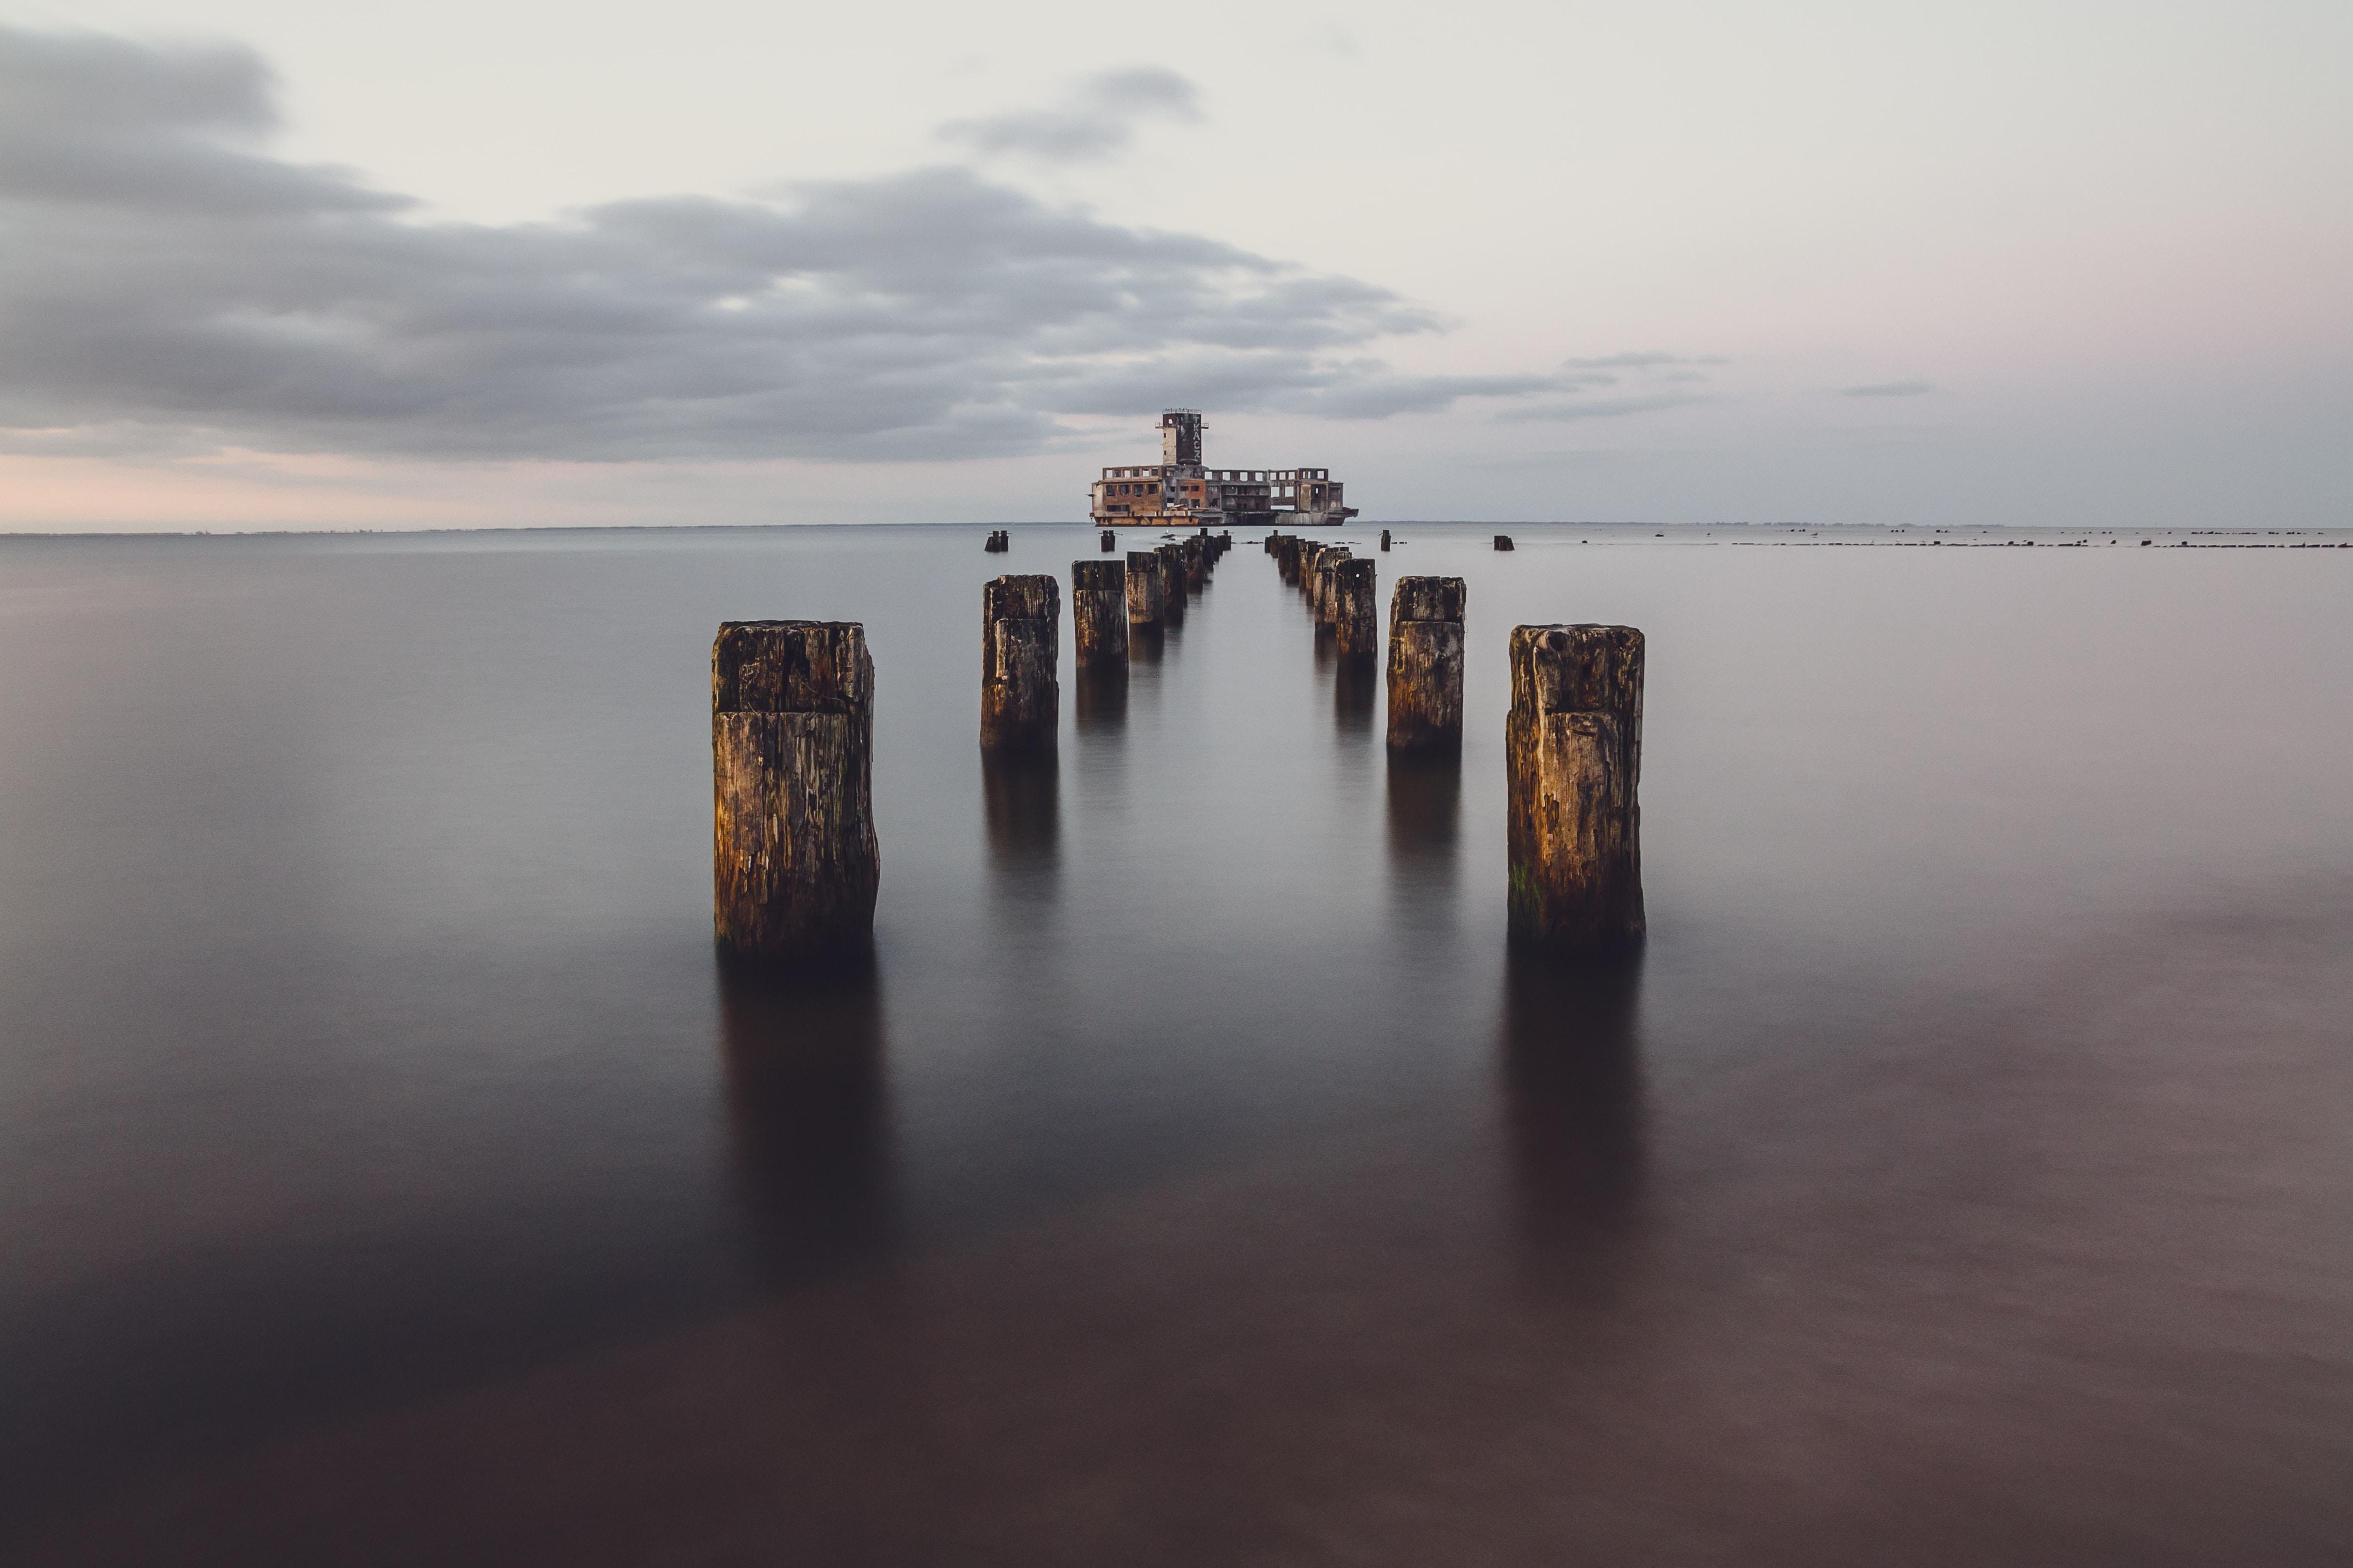 brown wooden dock pillar